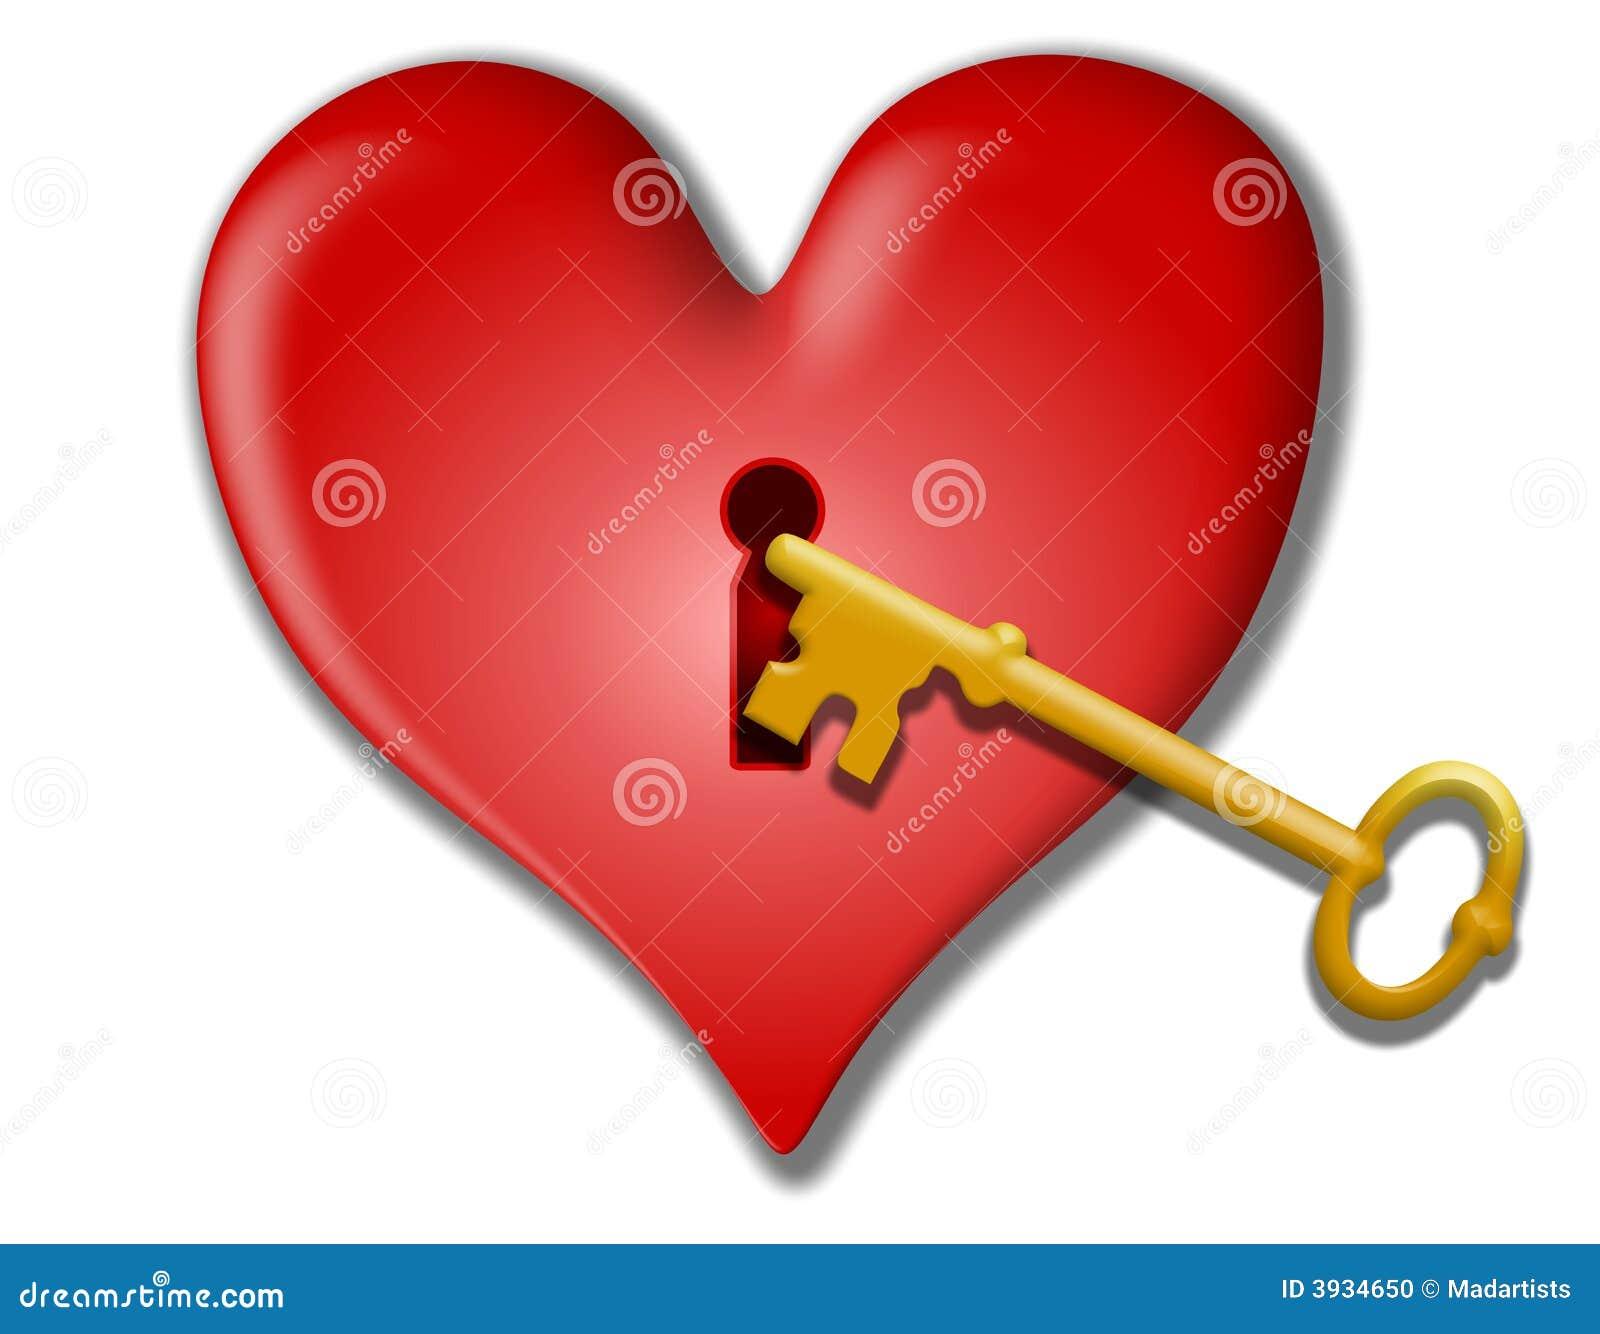 key to my heart valentine clip art stock illustration illustration rh dreamstime com clip art valentine heart heart clipart valentines